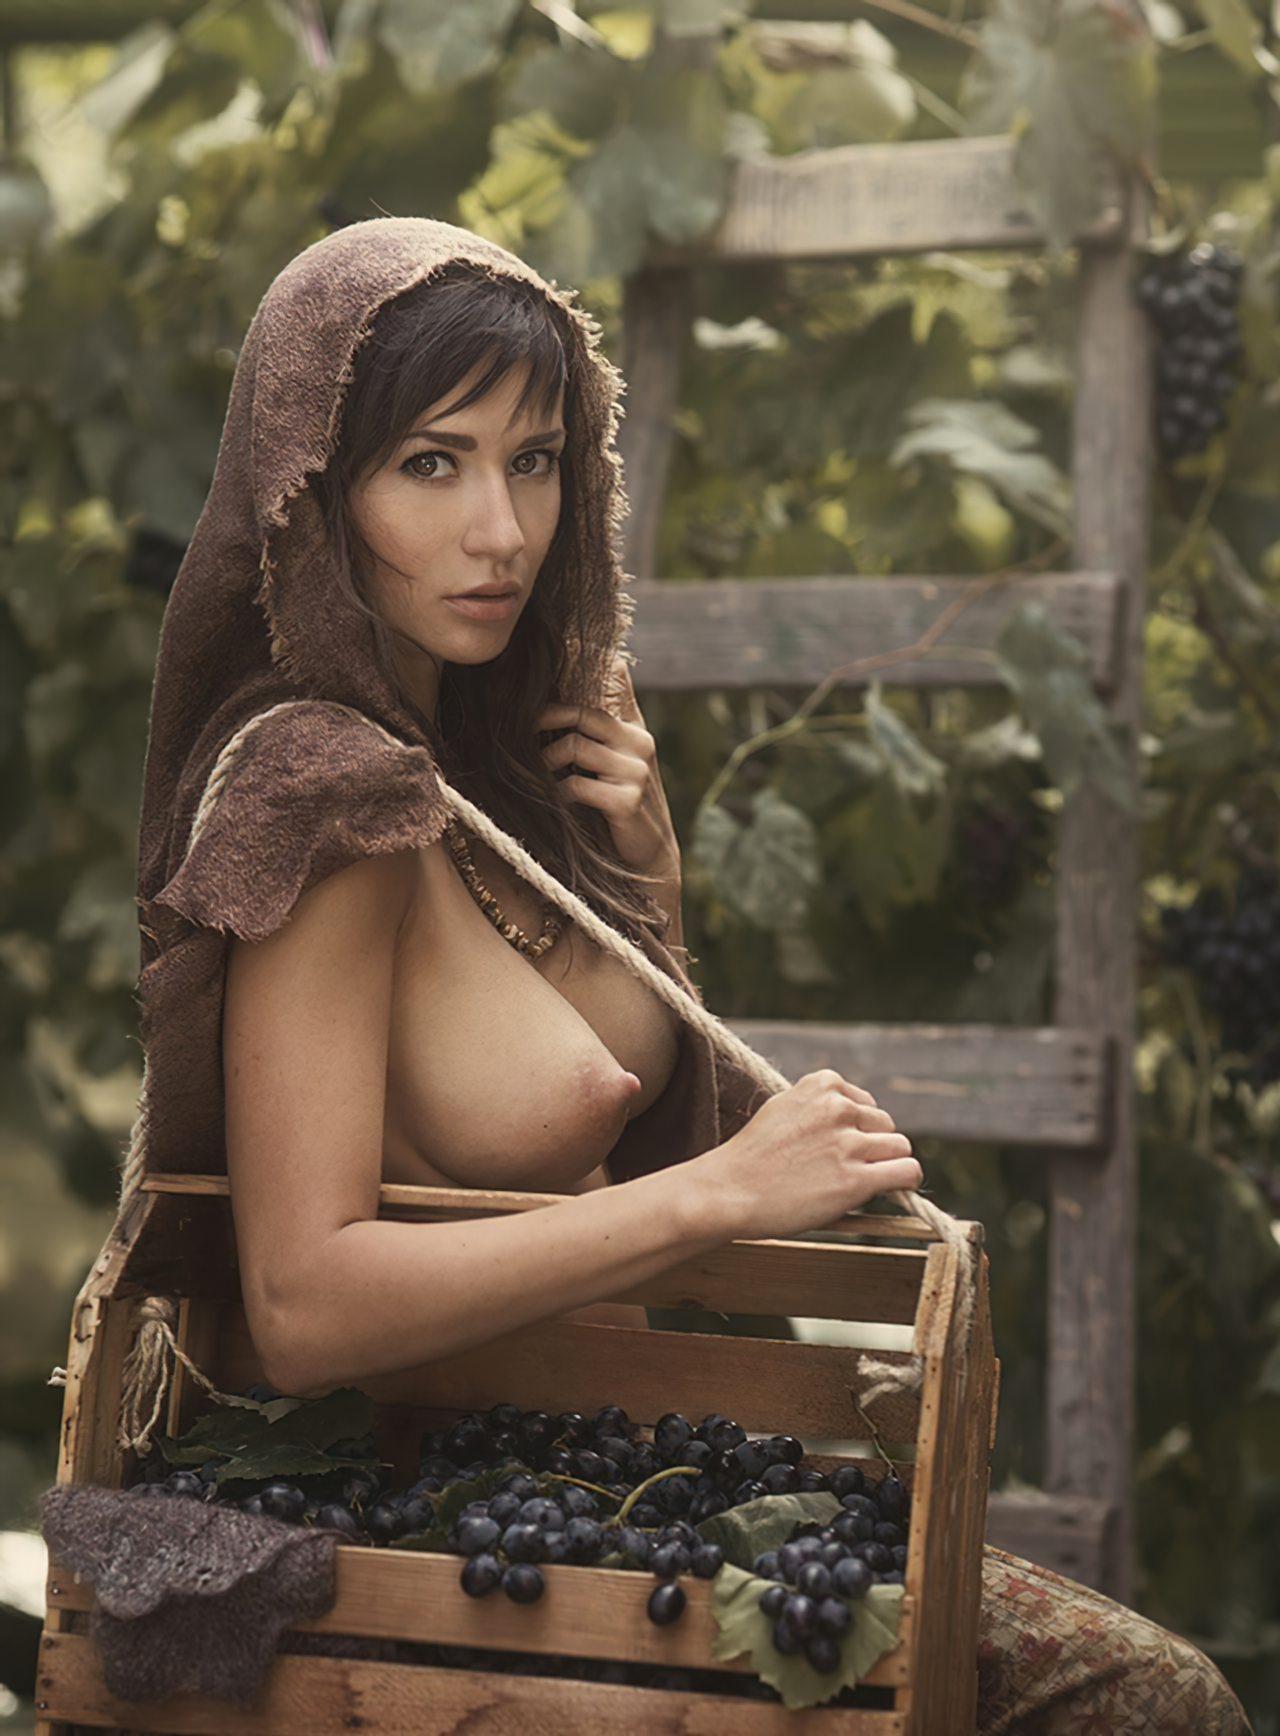 Mulher Nua (50)